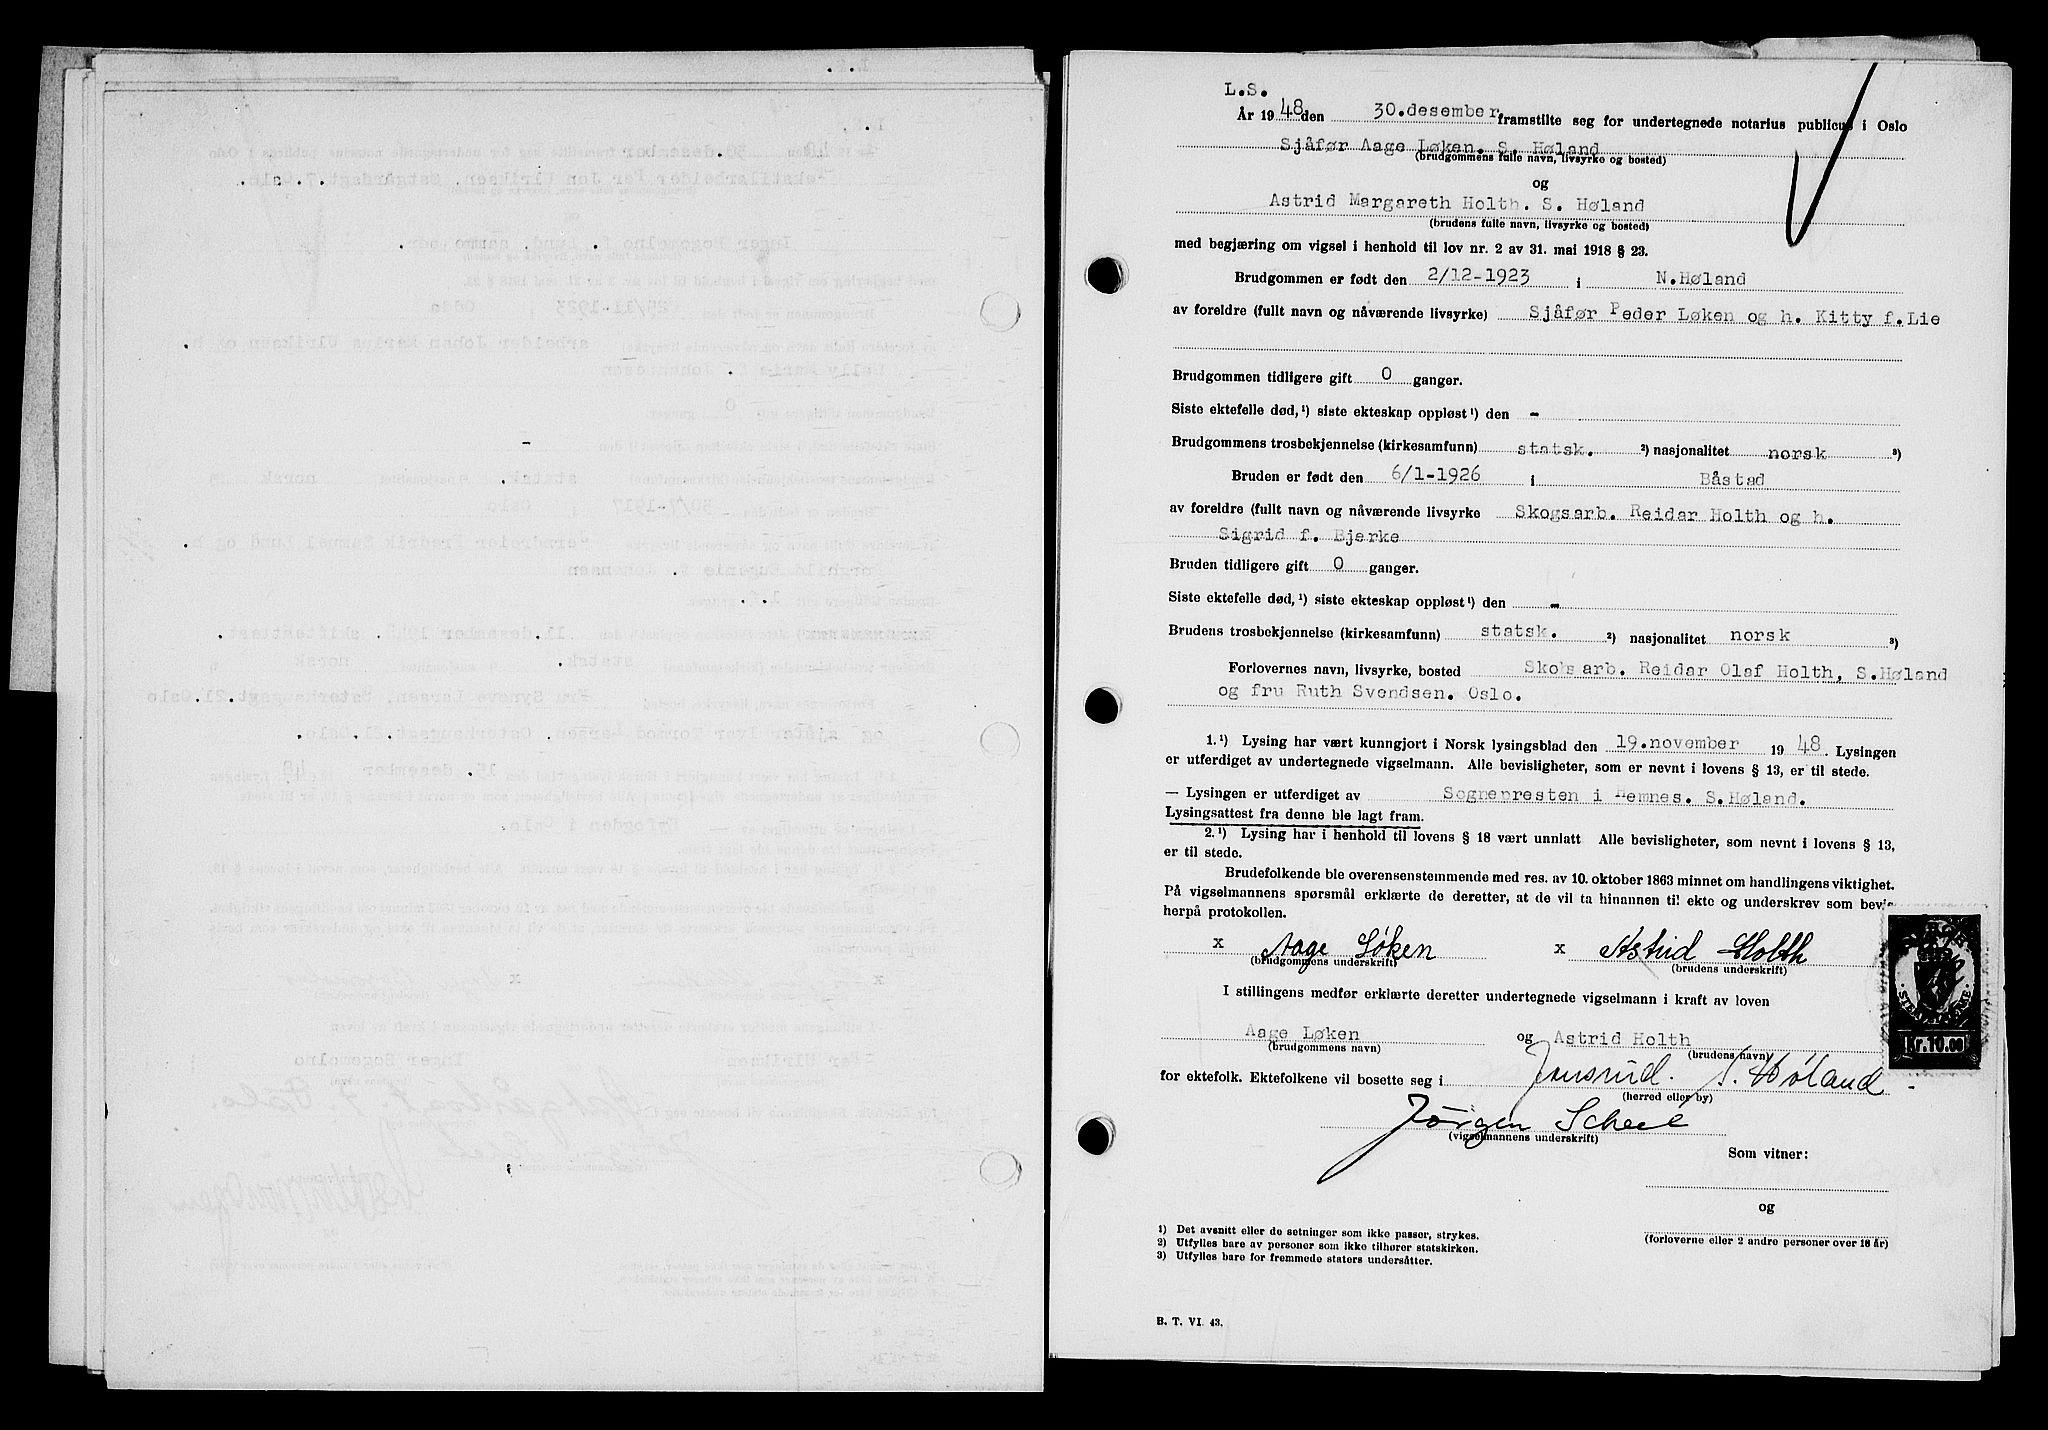 SAO, Oslo byfogd avd. I, L/Lb/Lbb/L0064: Notarialprotokoll, rekke II: Vigsler, 1948-1949